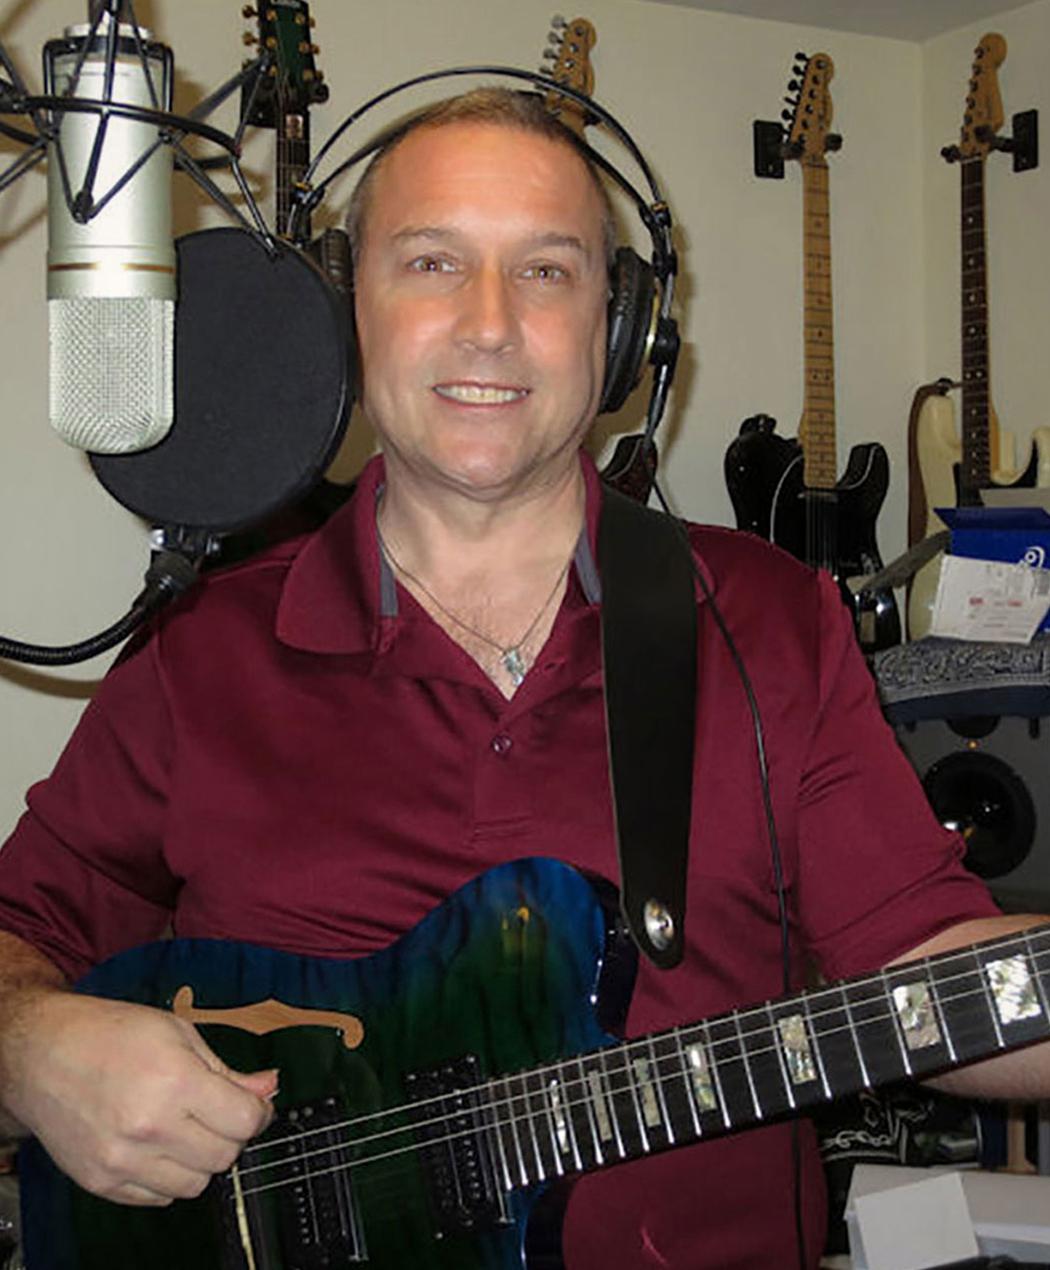 Dennis Veator